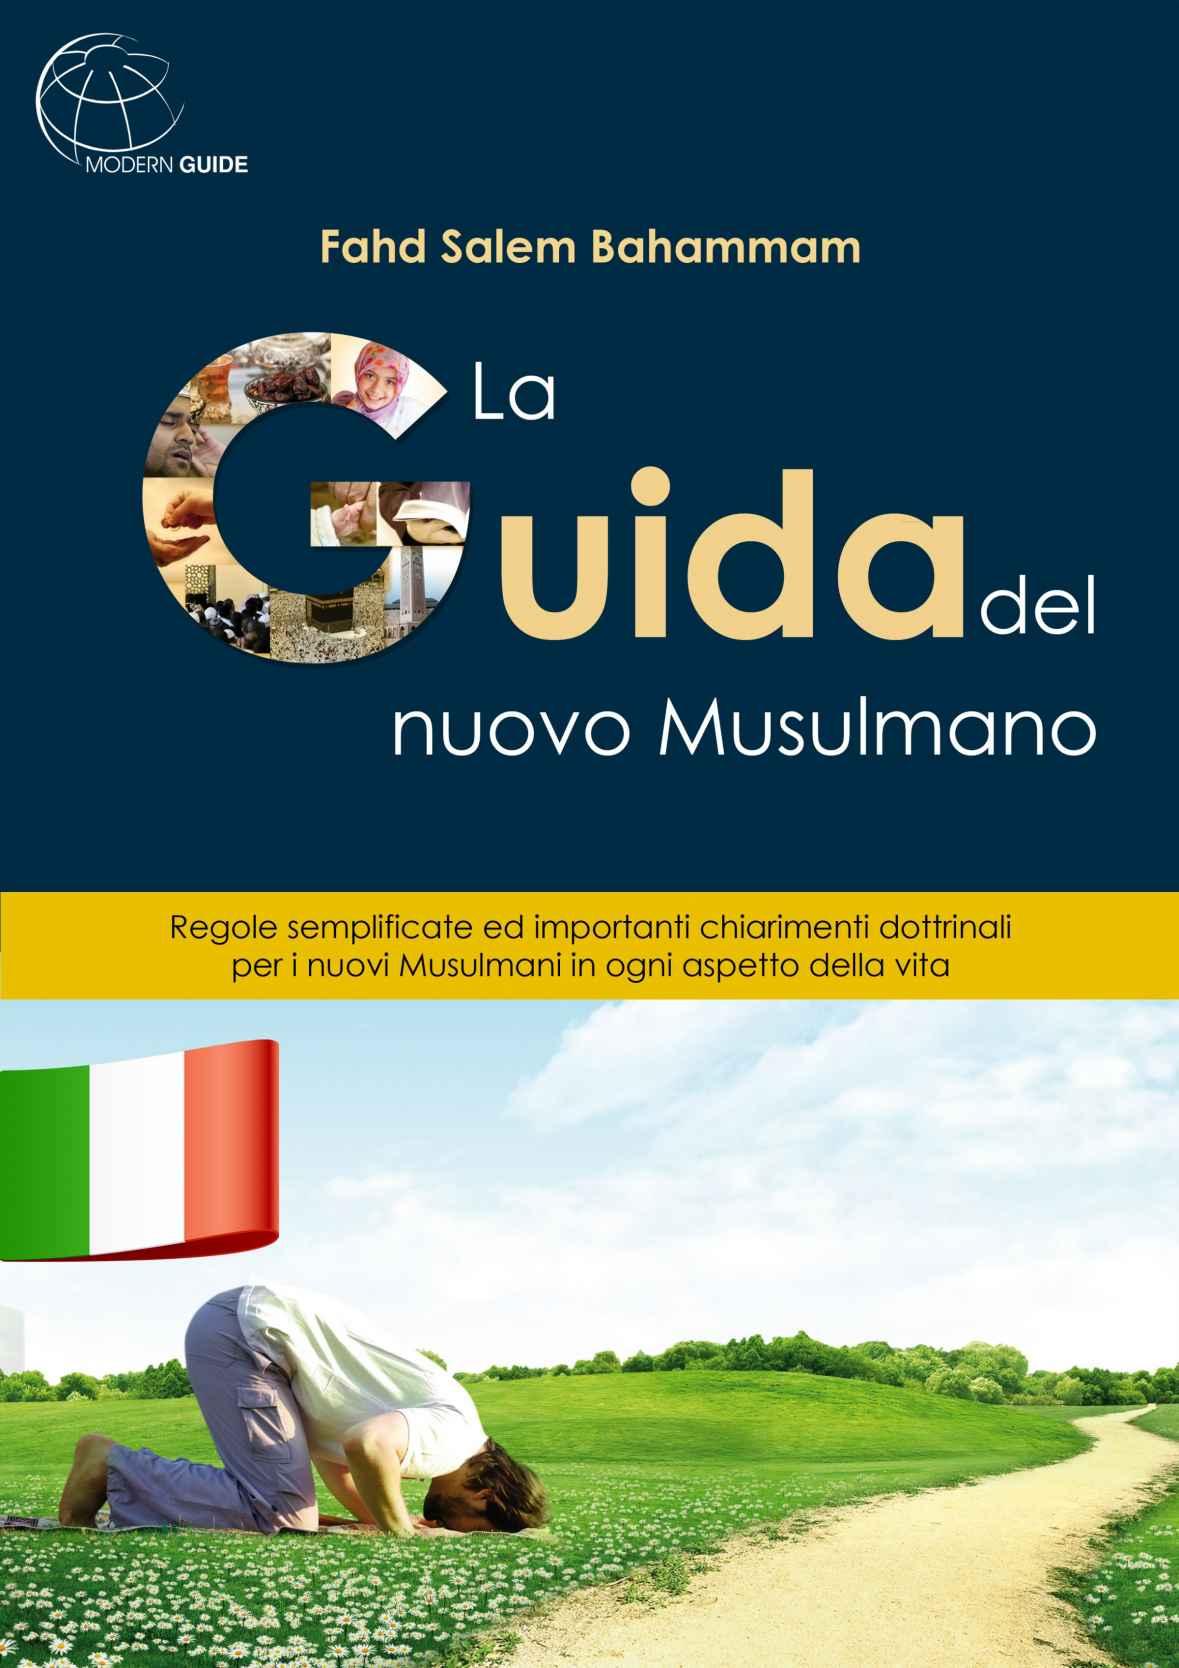 La guida del nuovo musulmano